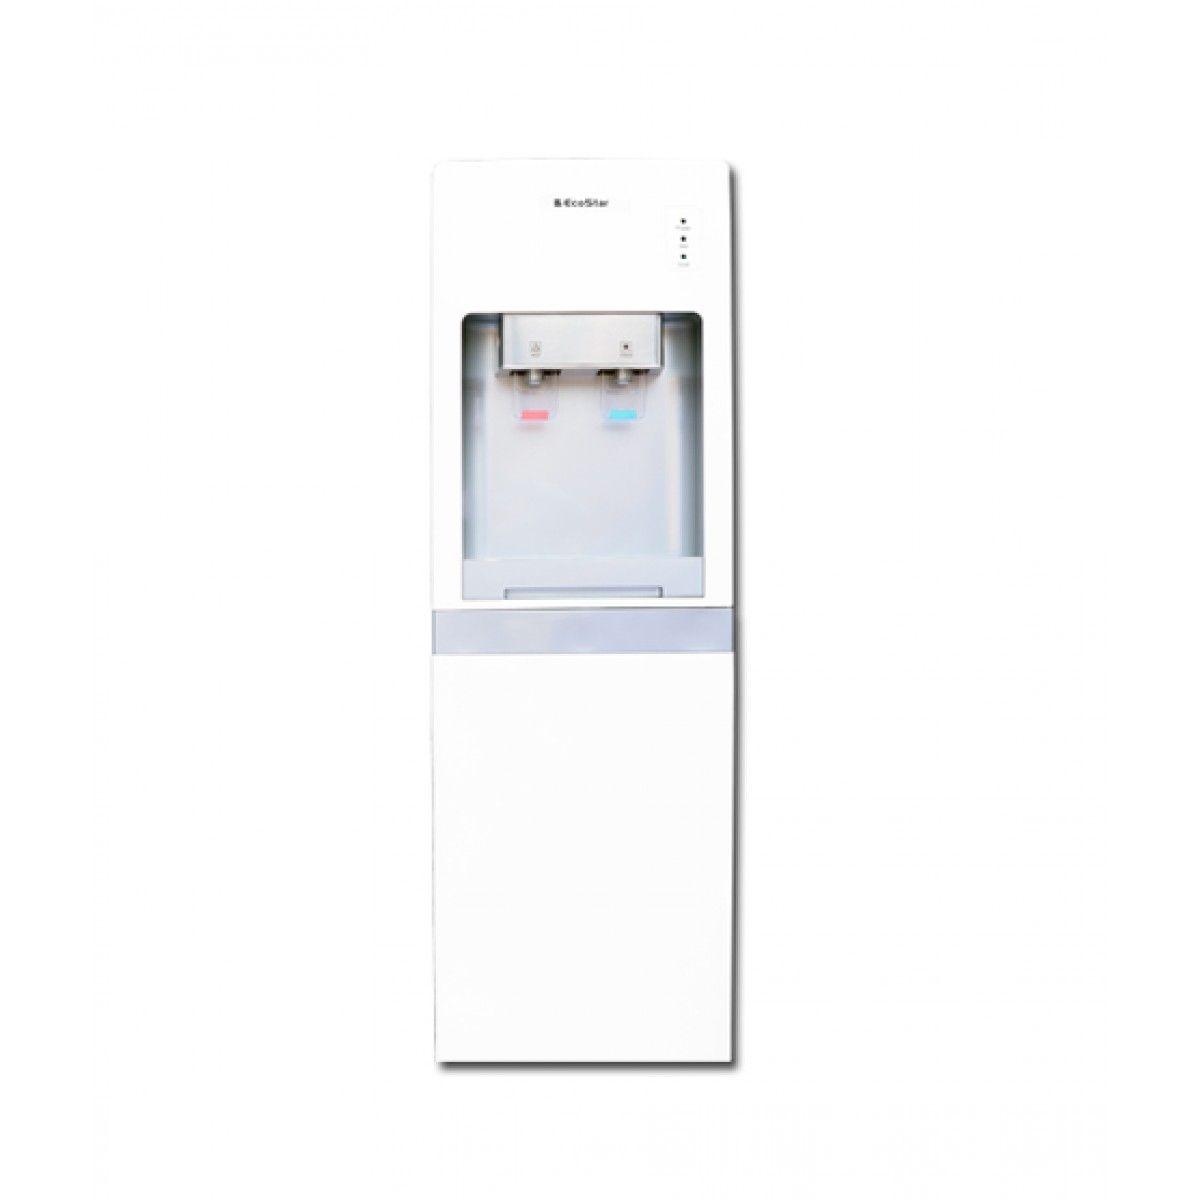 EcoStar 2 Tap WD-300 Water Dispenser